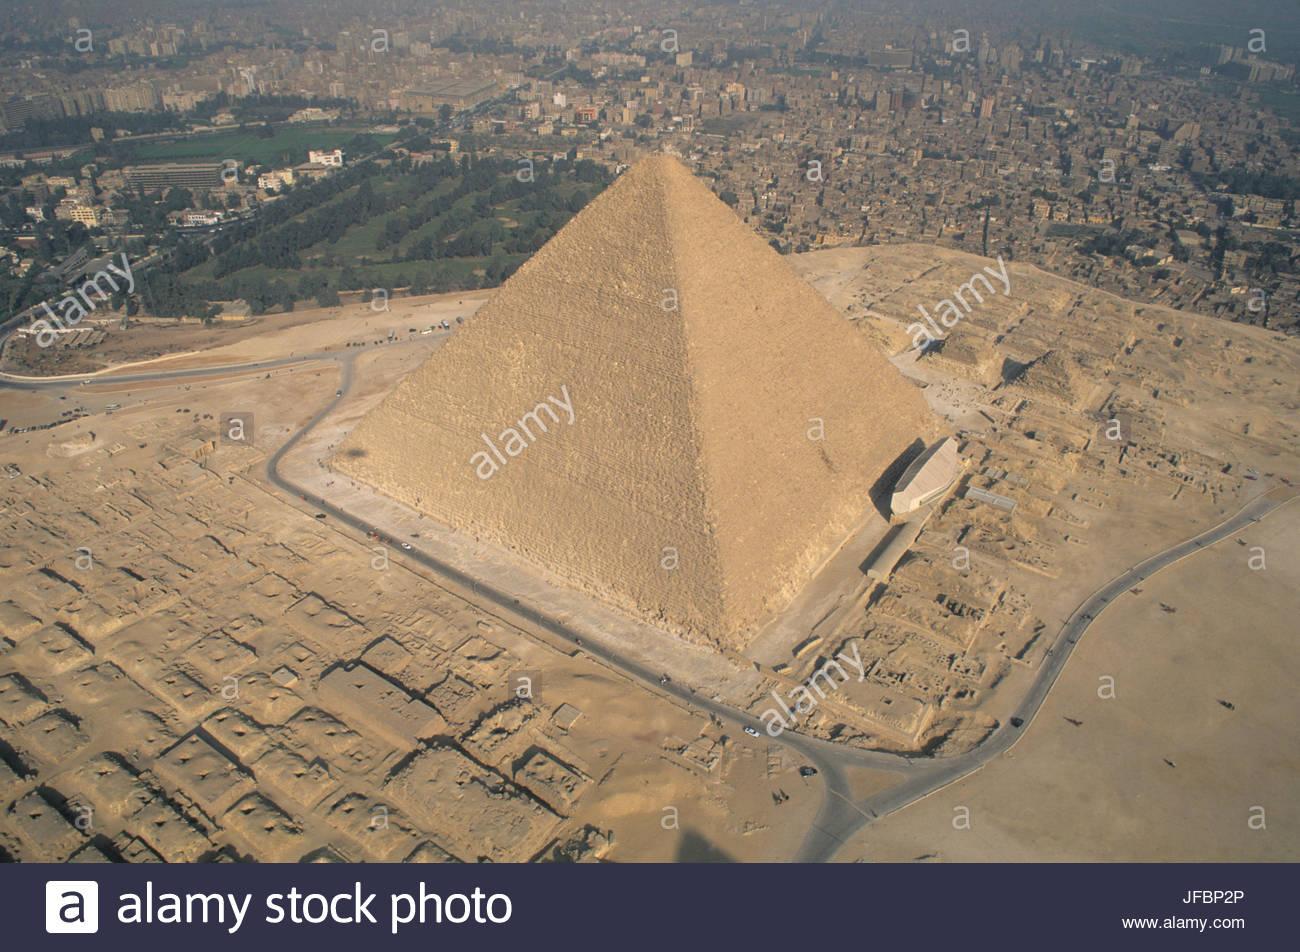 La pyramide de Chéops. Photo Stock